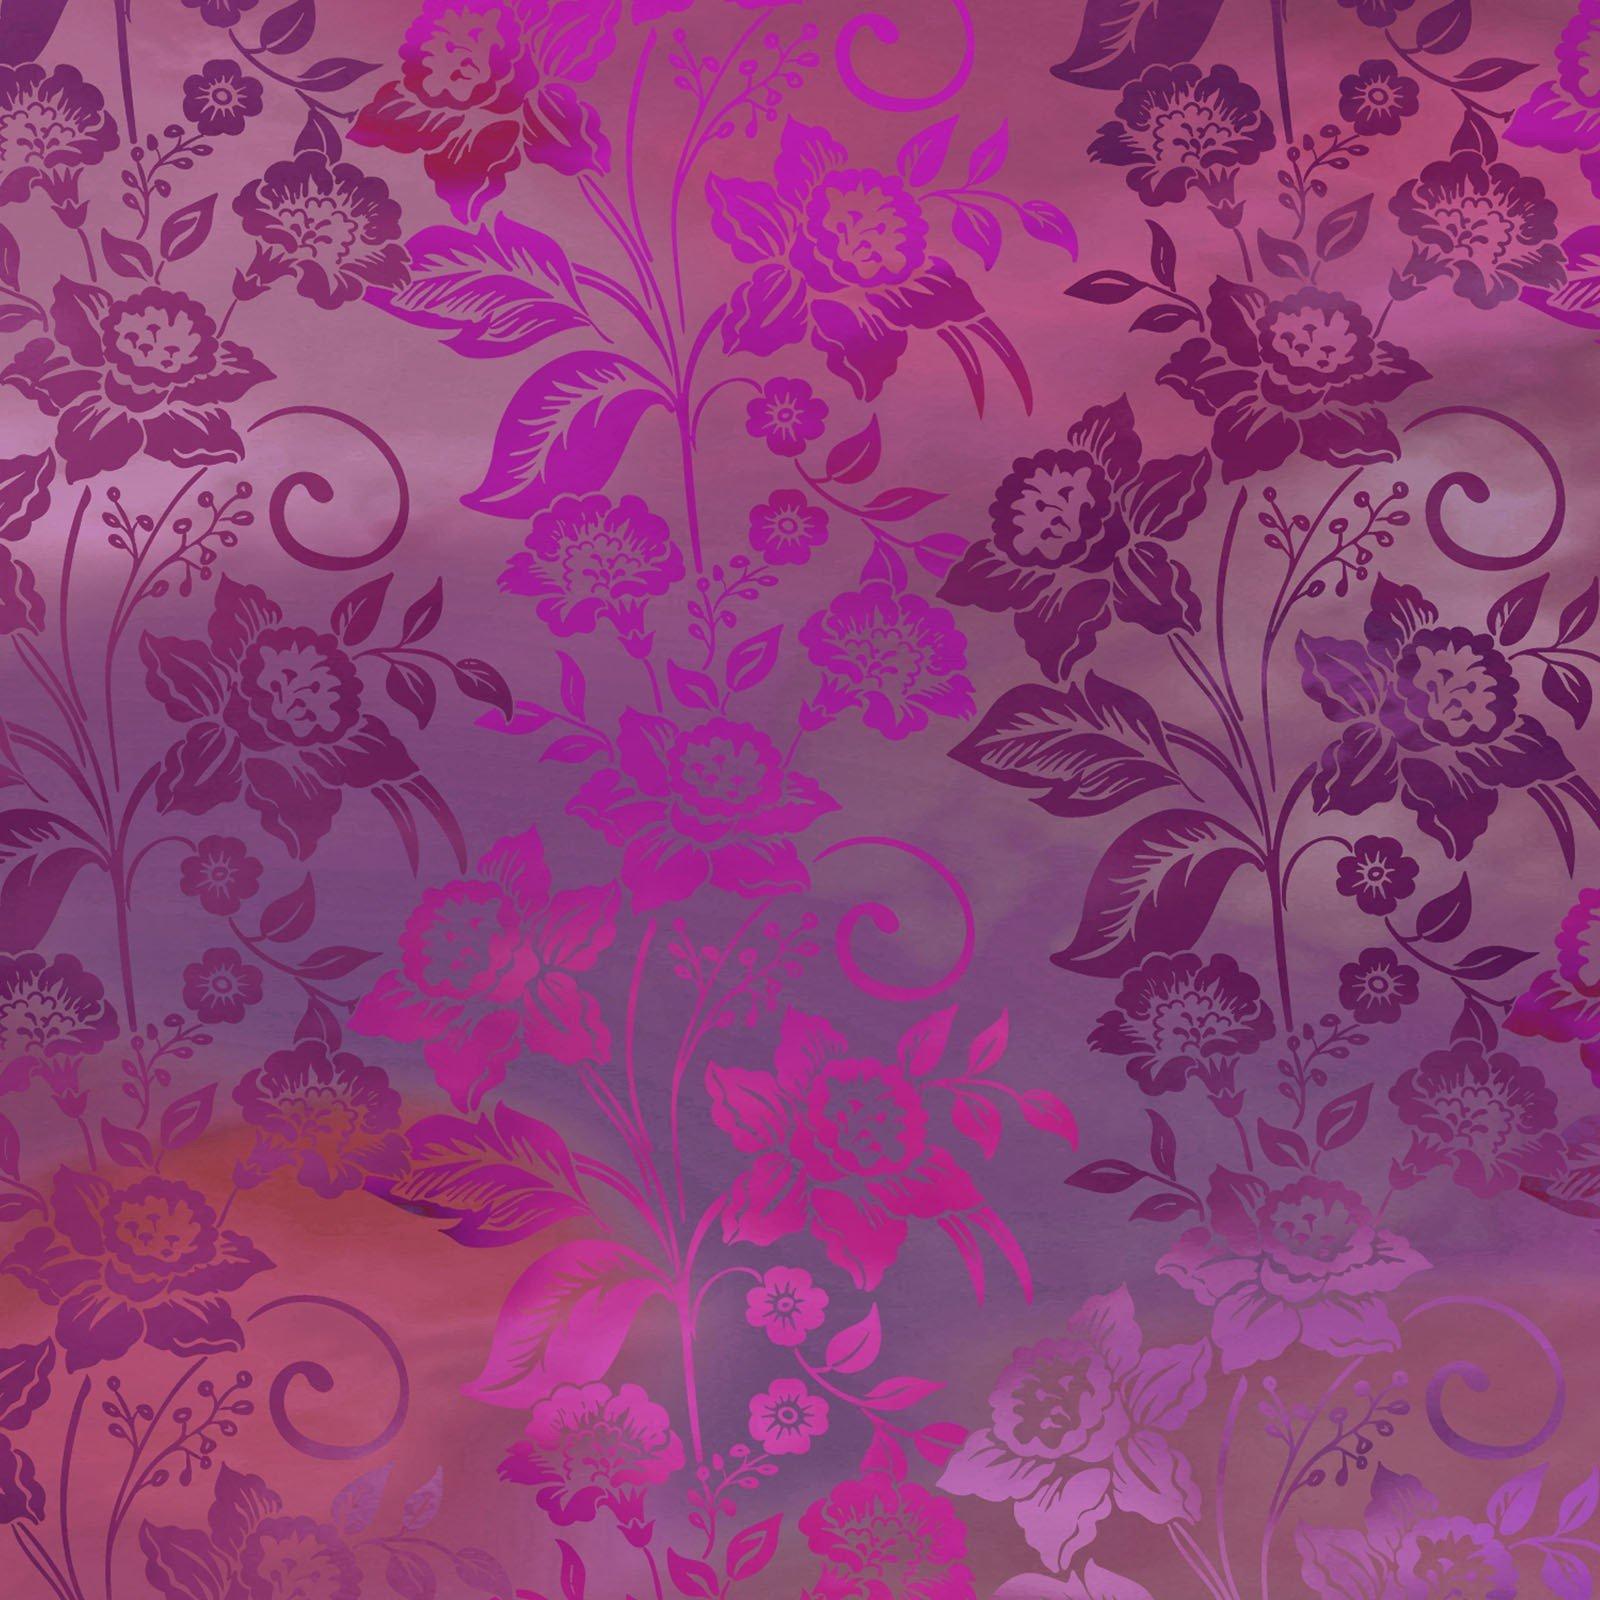 Diaphanous 5ENC-4 Magenta Enchanted Vines